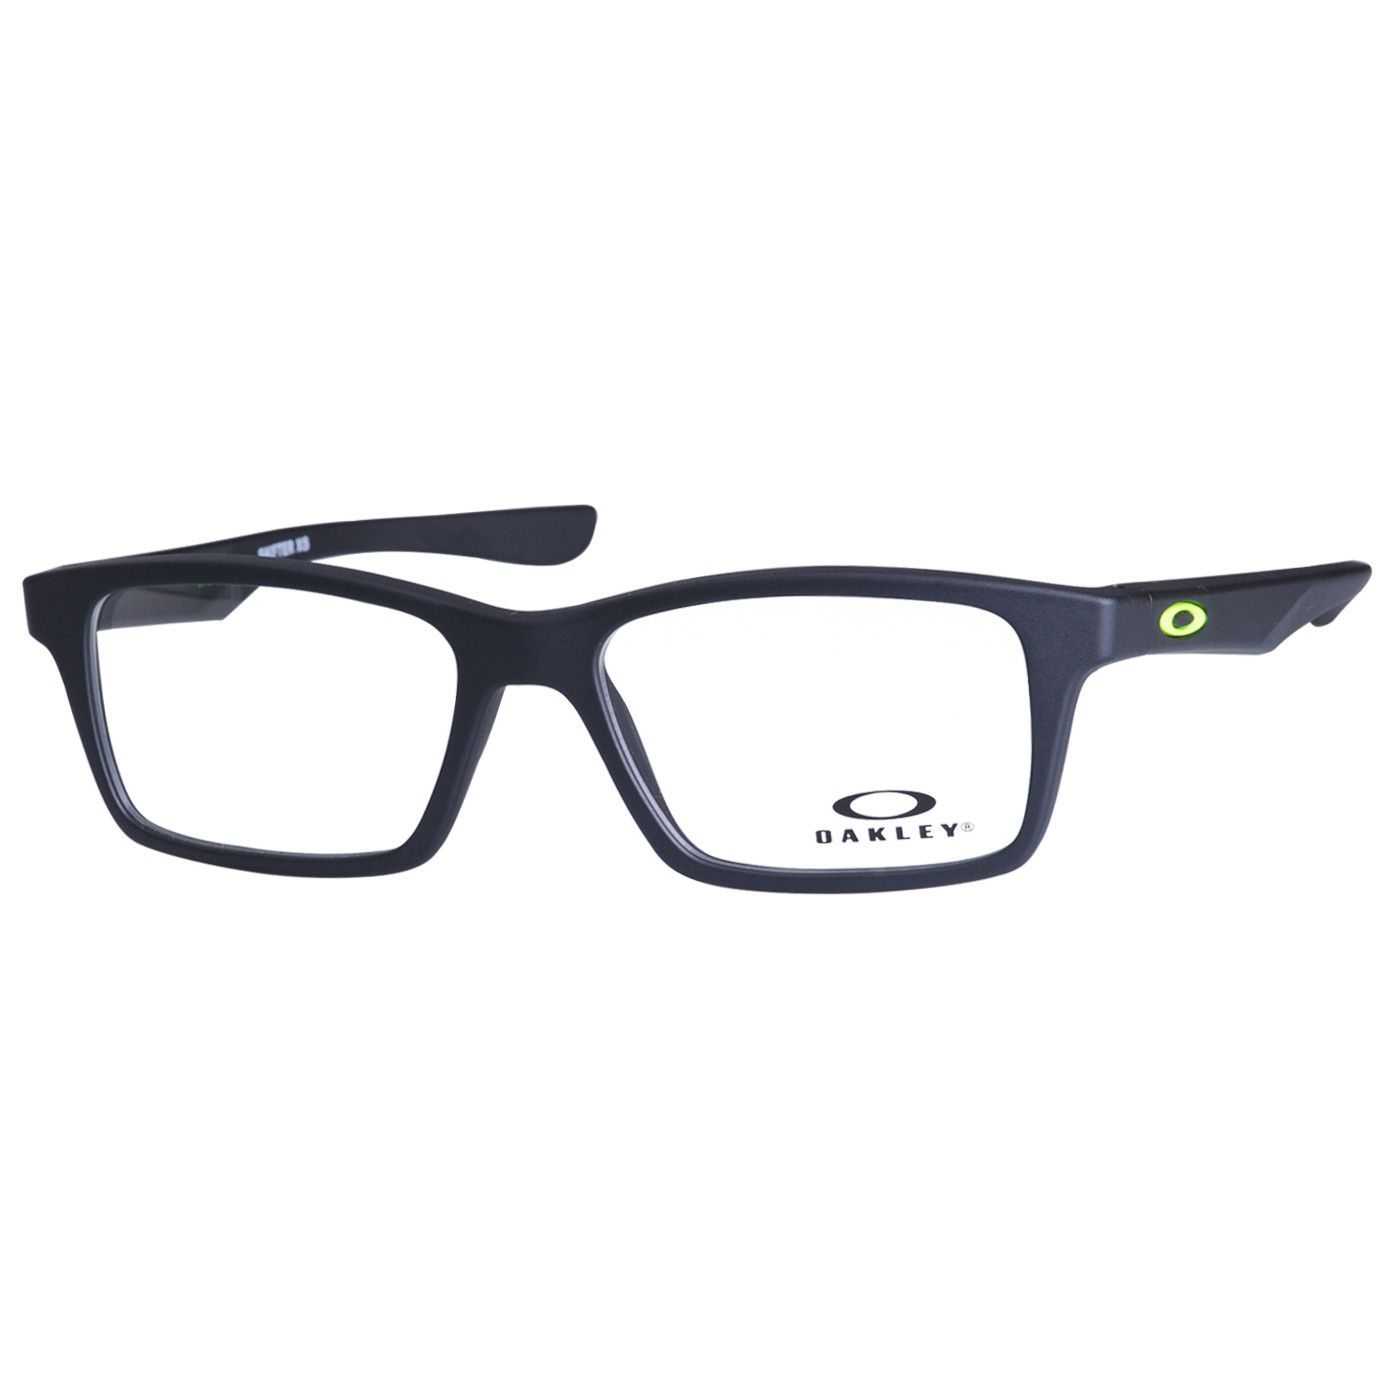 Armação De Óculos Infantil Oakley Oy8001-0150 50-15 128 - Omega ... d1960db97f